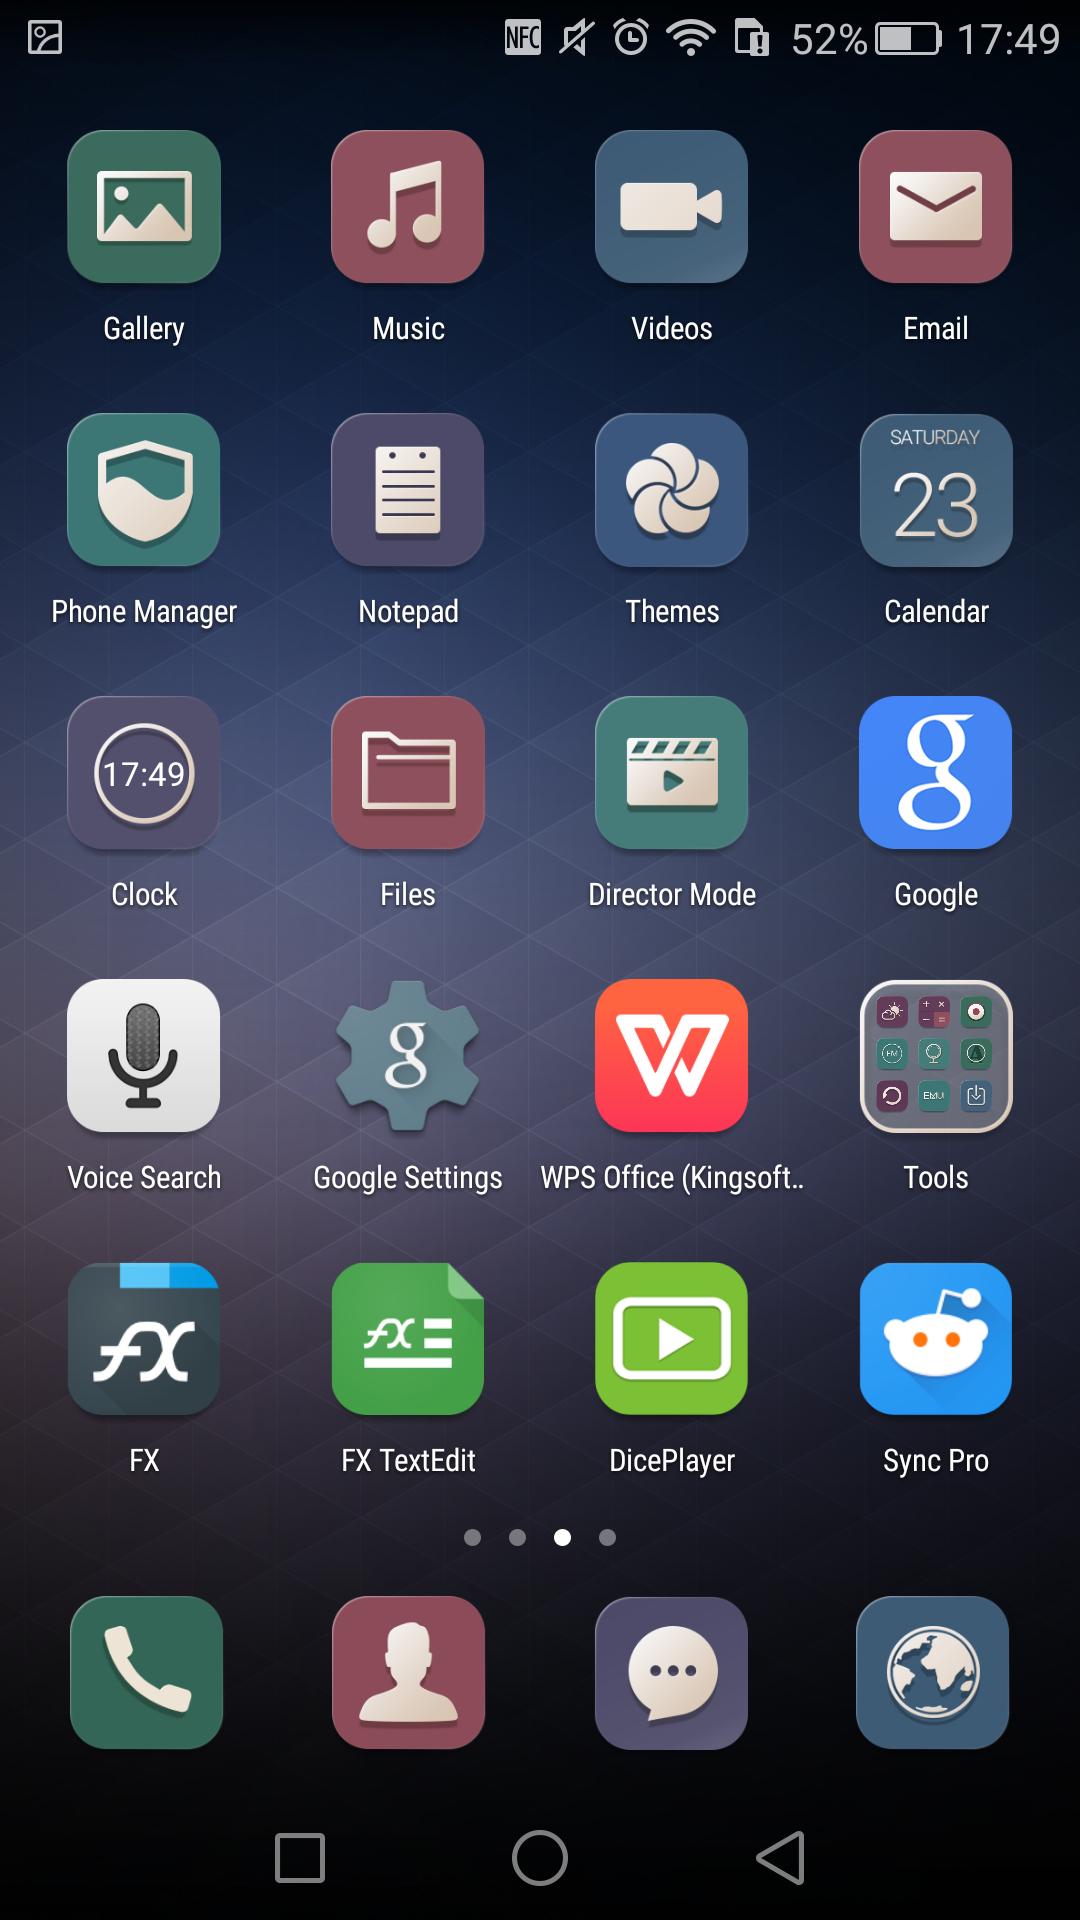 huawei p8 apps